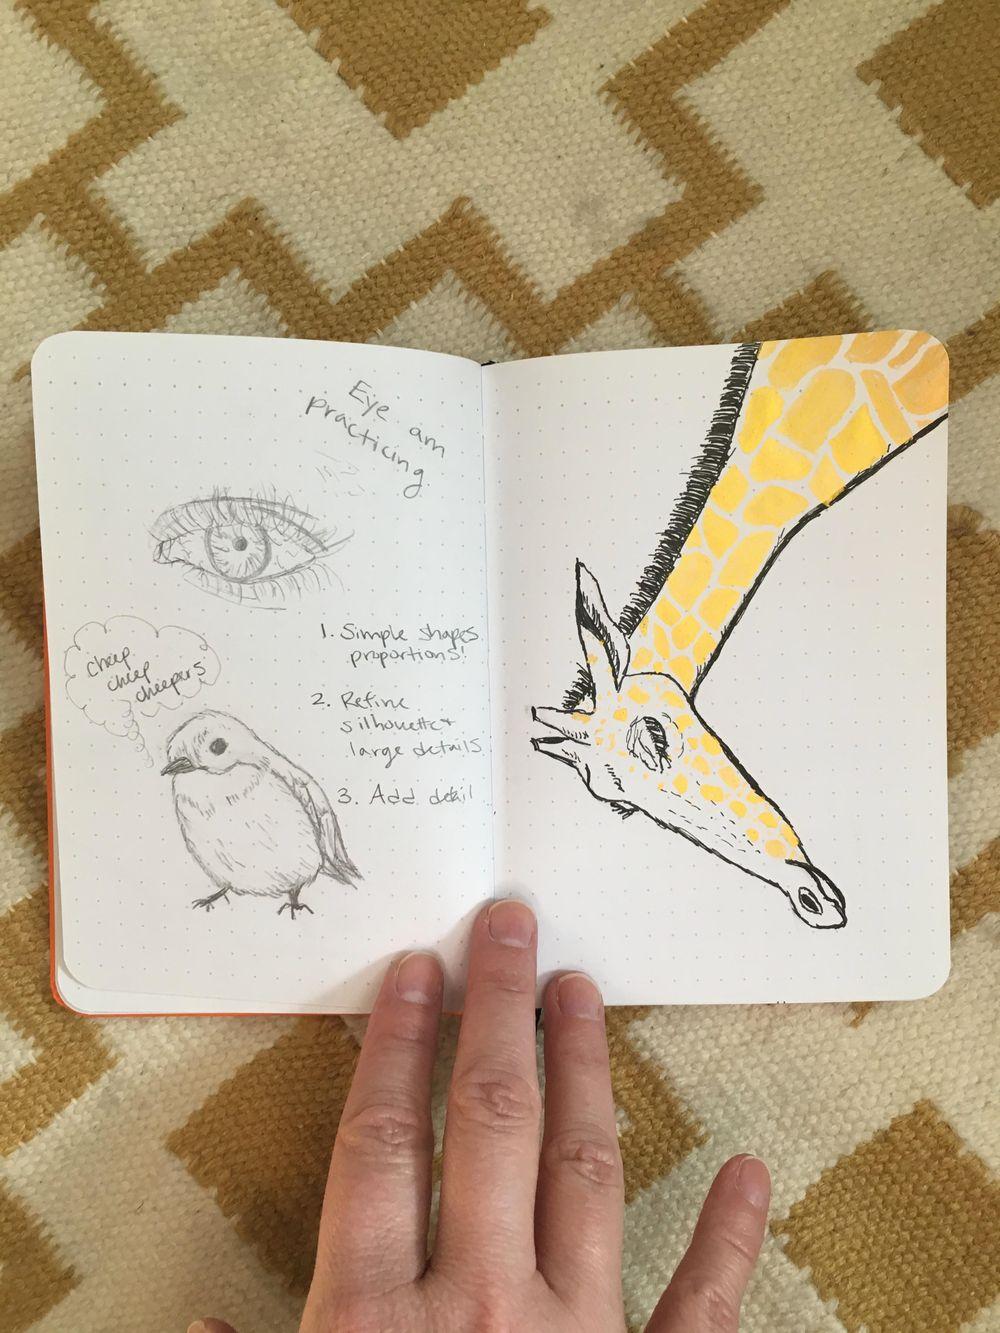 Practice + Bird + Giraffe + Flamingo - image 2 - student project